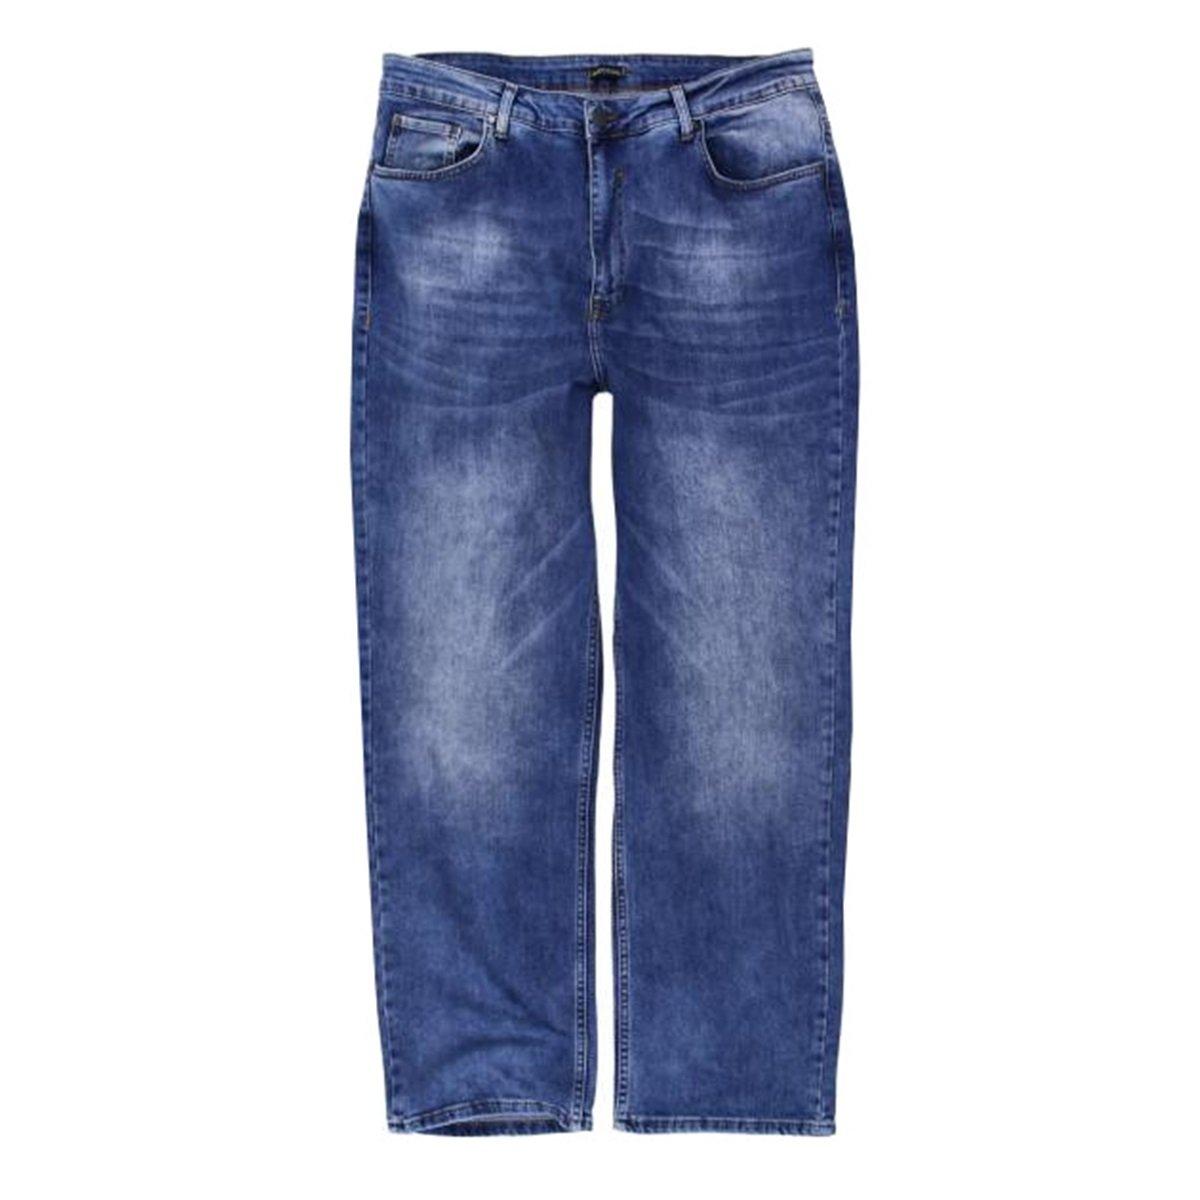 5755 Lavecchia Designer Herren Jeans Hose W38 40 42 44 46 48 50 52 Übergröße